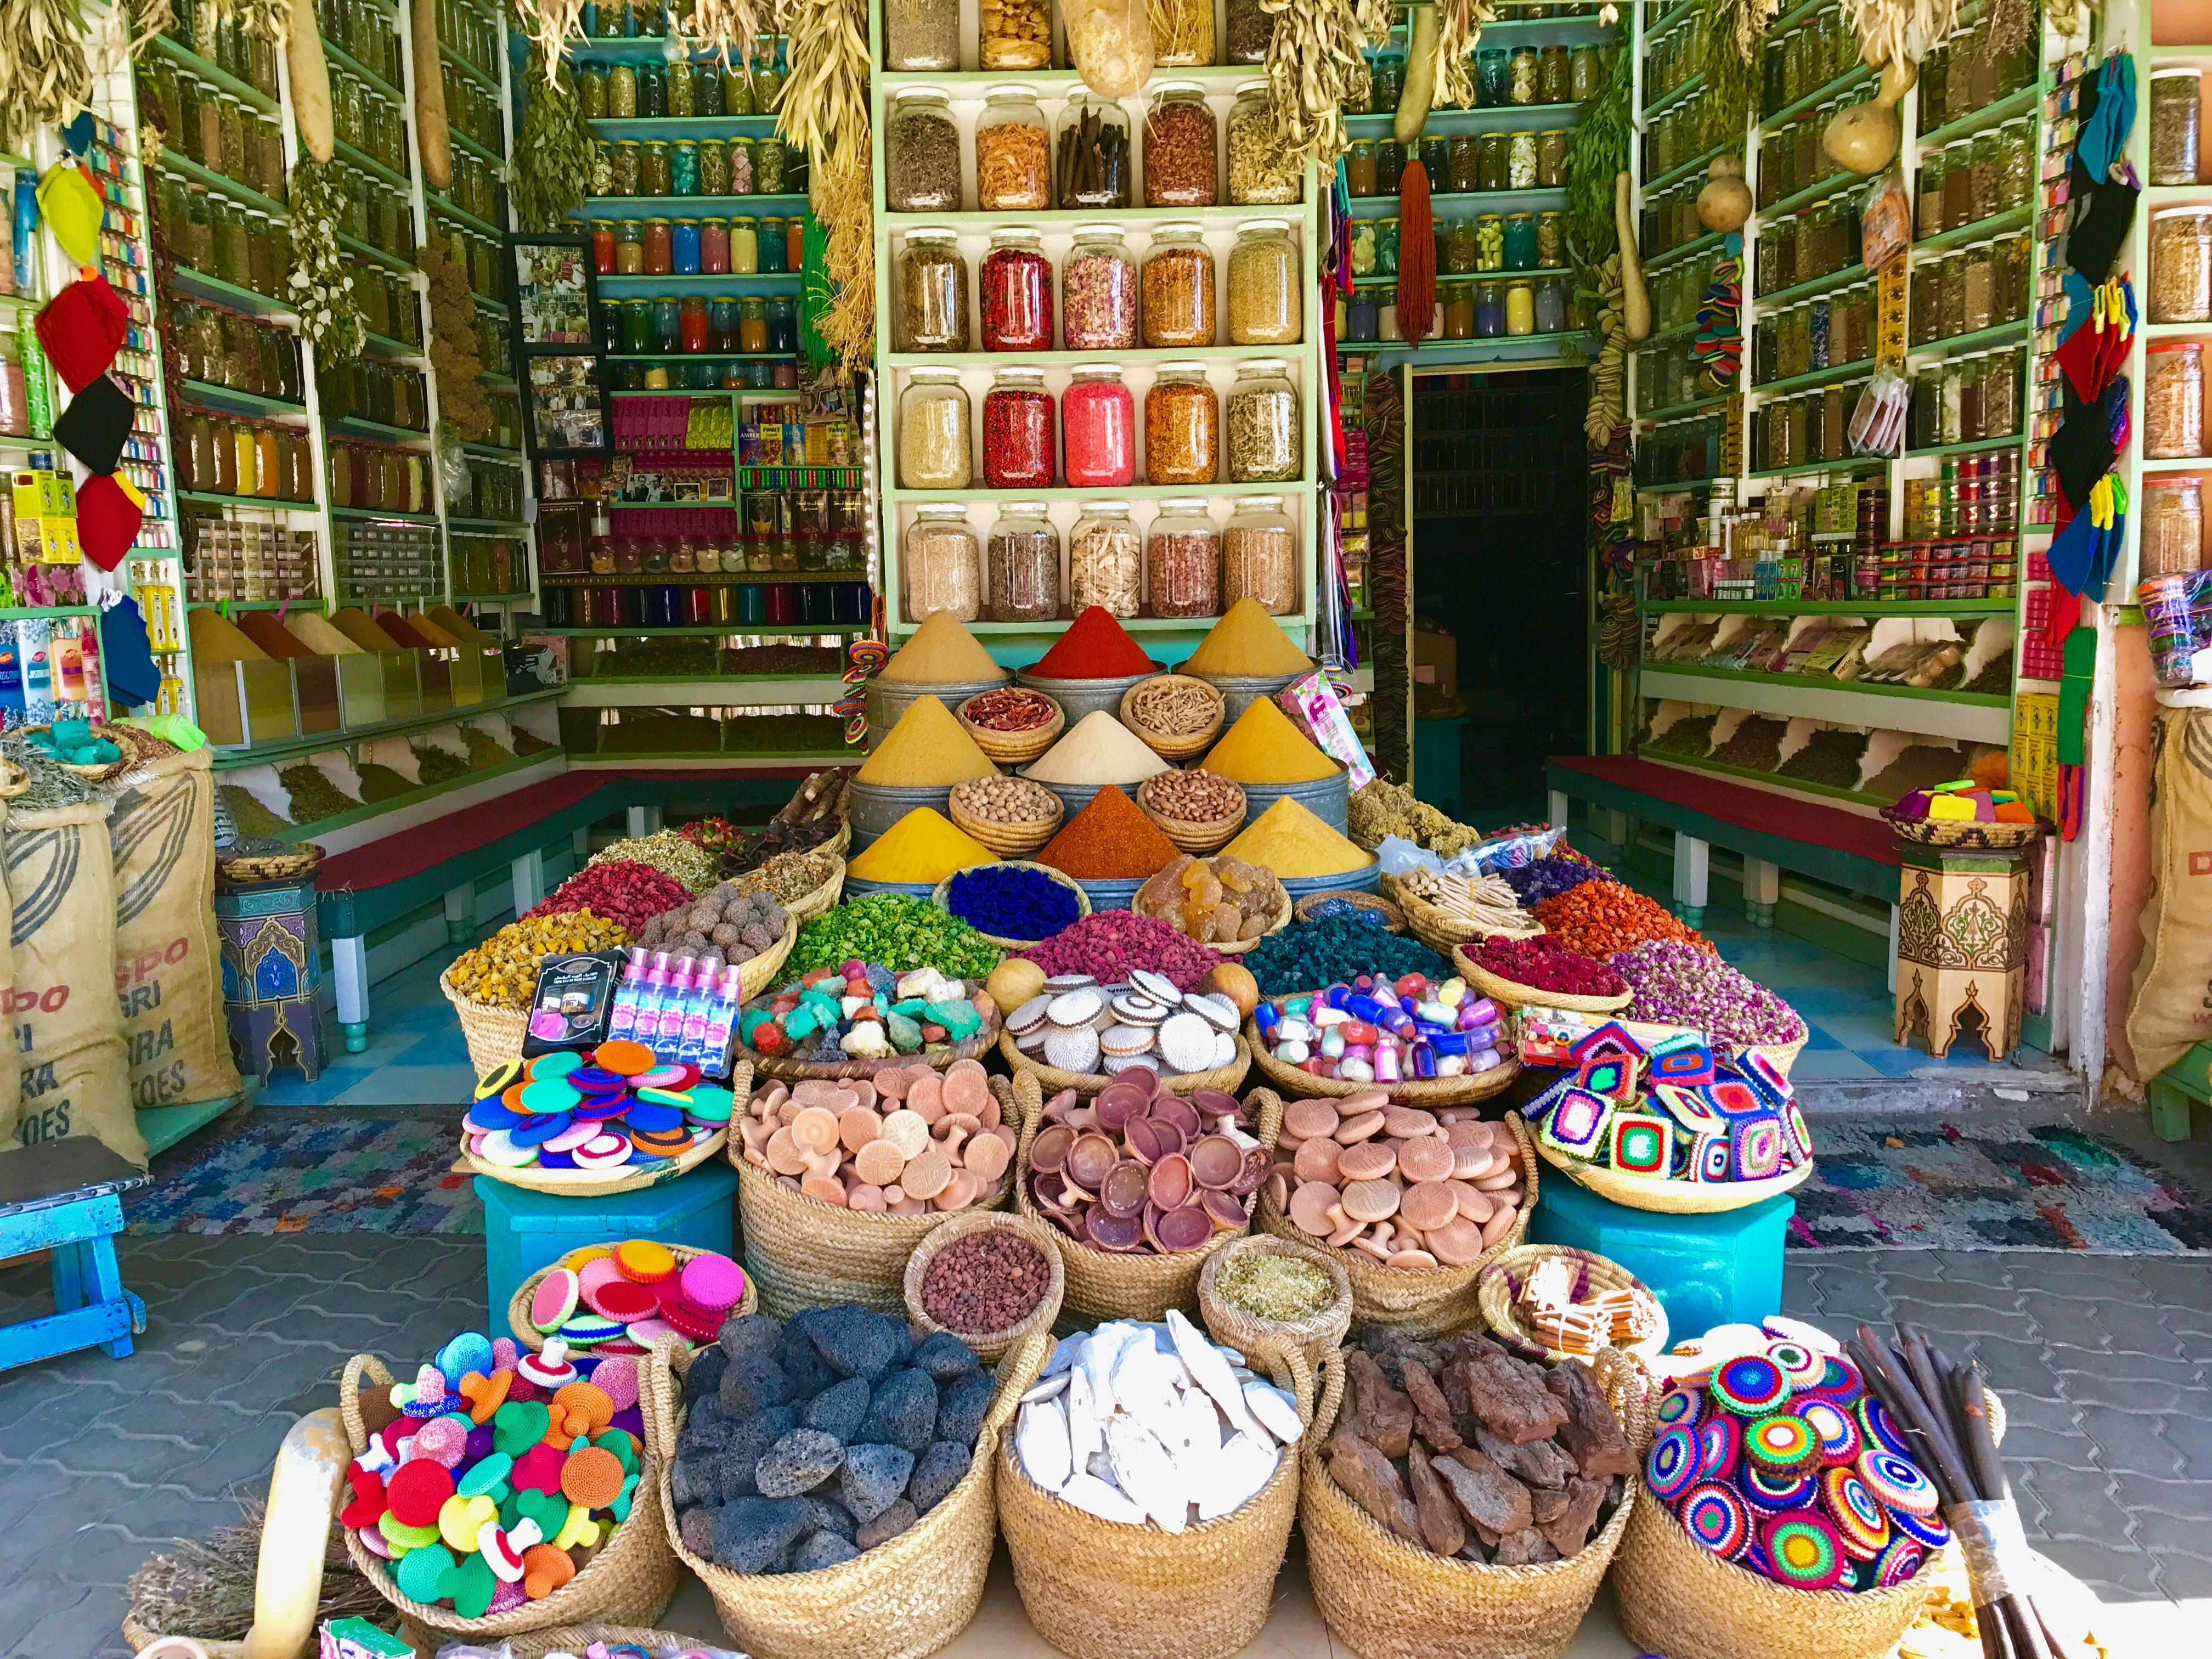 spice_souk_marrakech_morocco_lustforthesublime